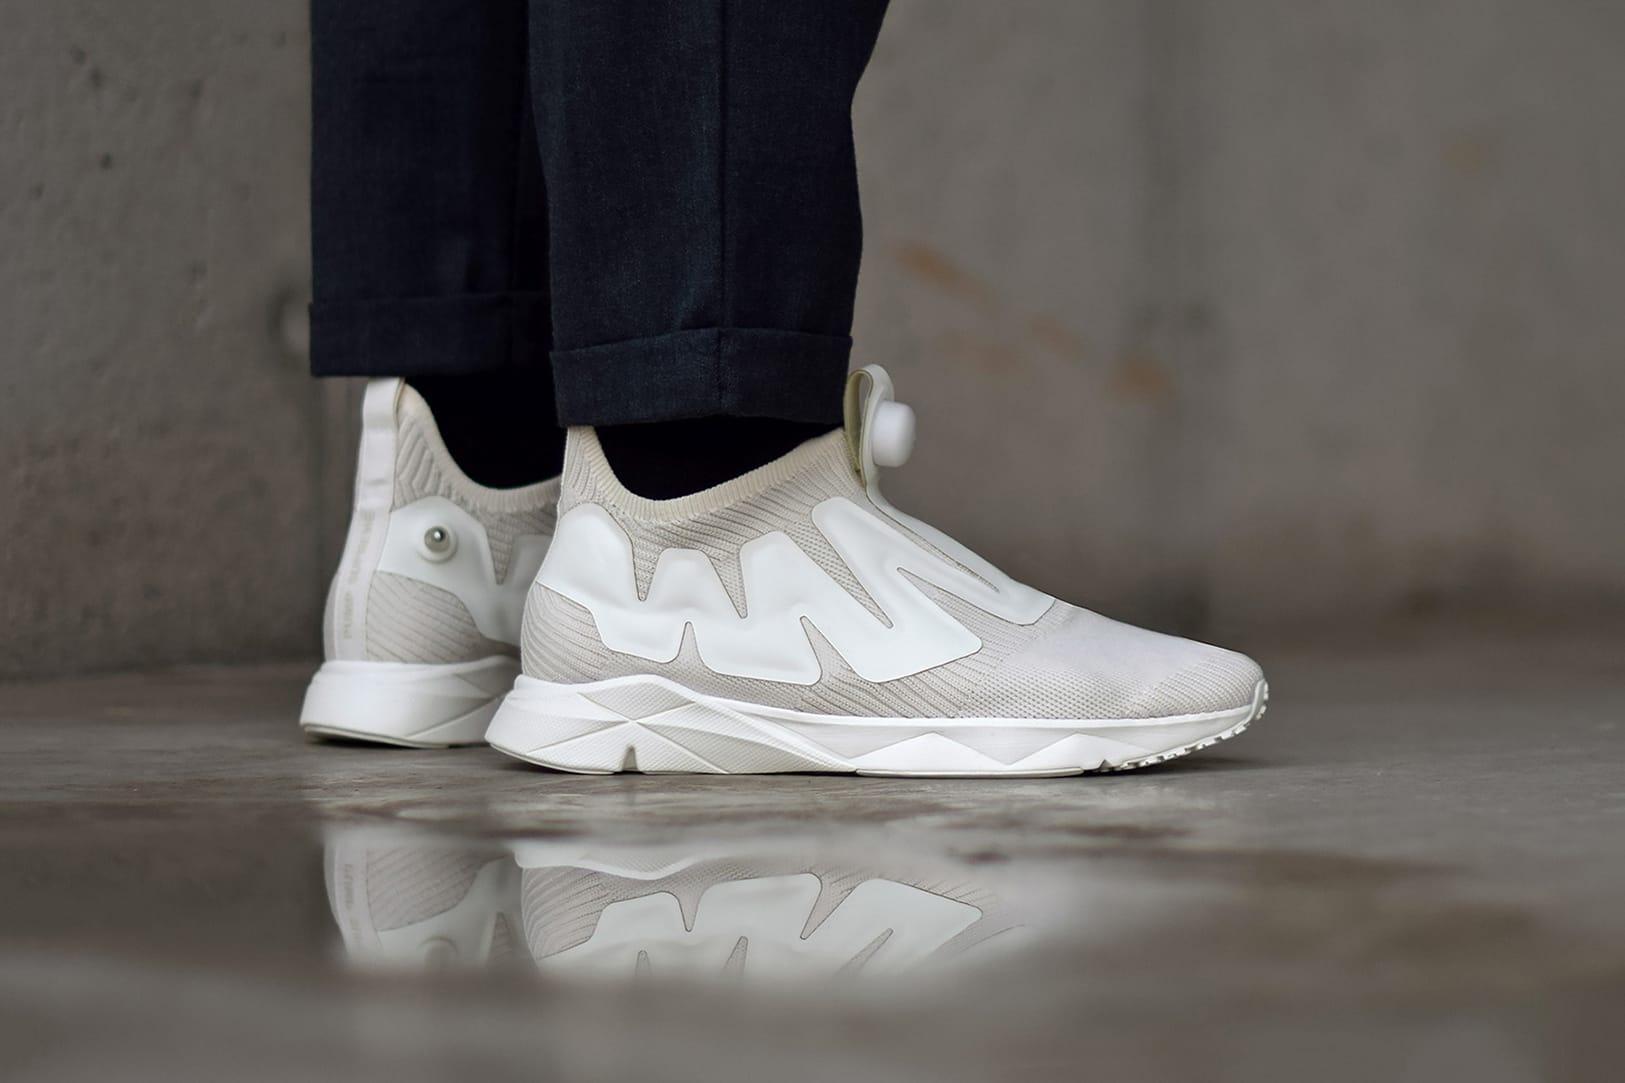 Reebok Reveals Pump Supreme Shoes For